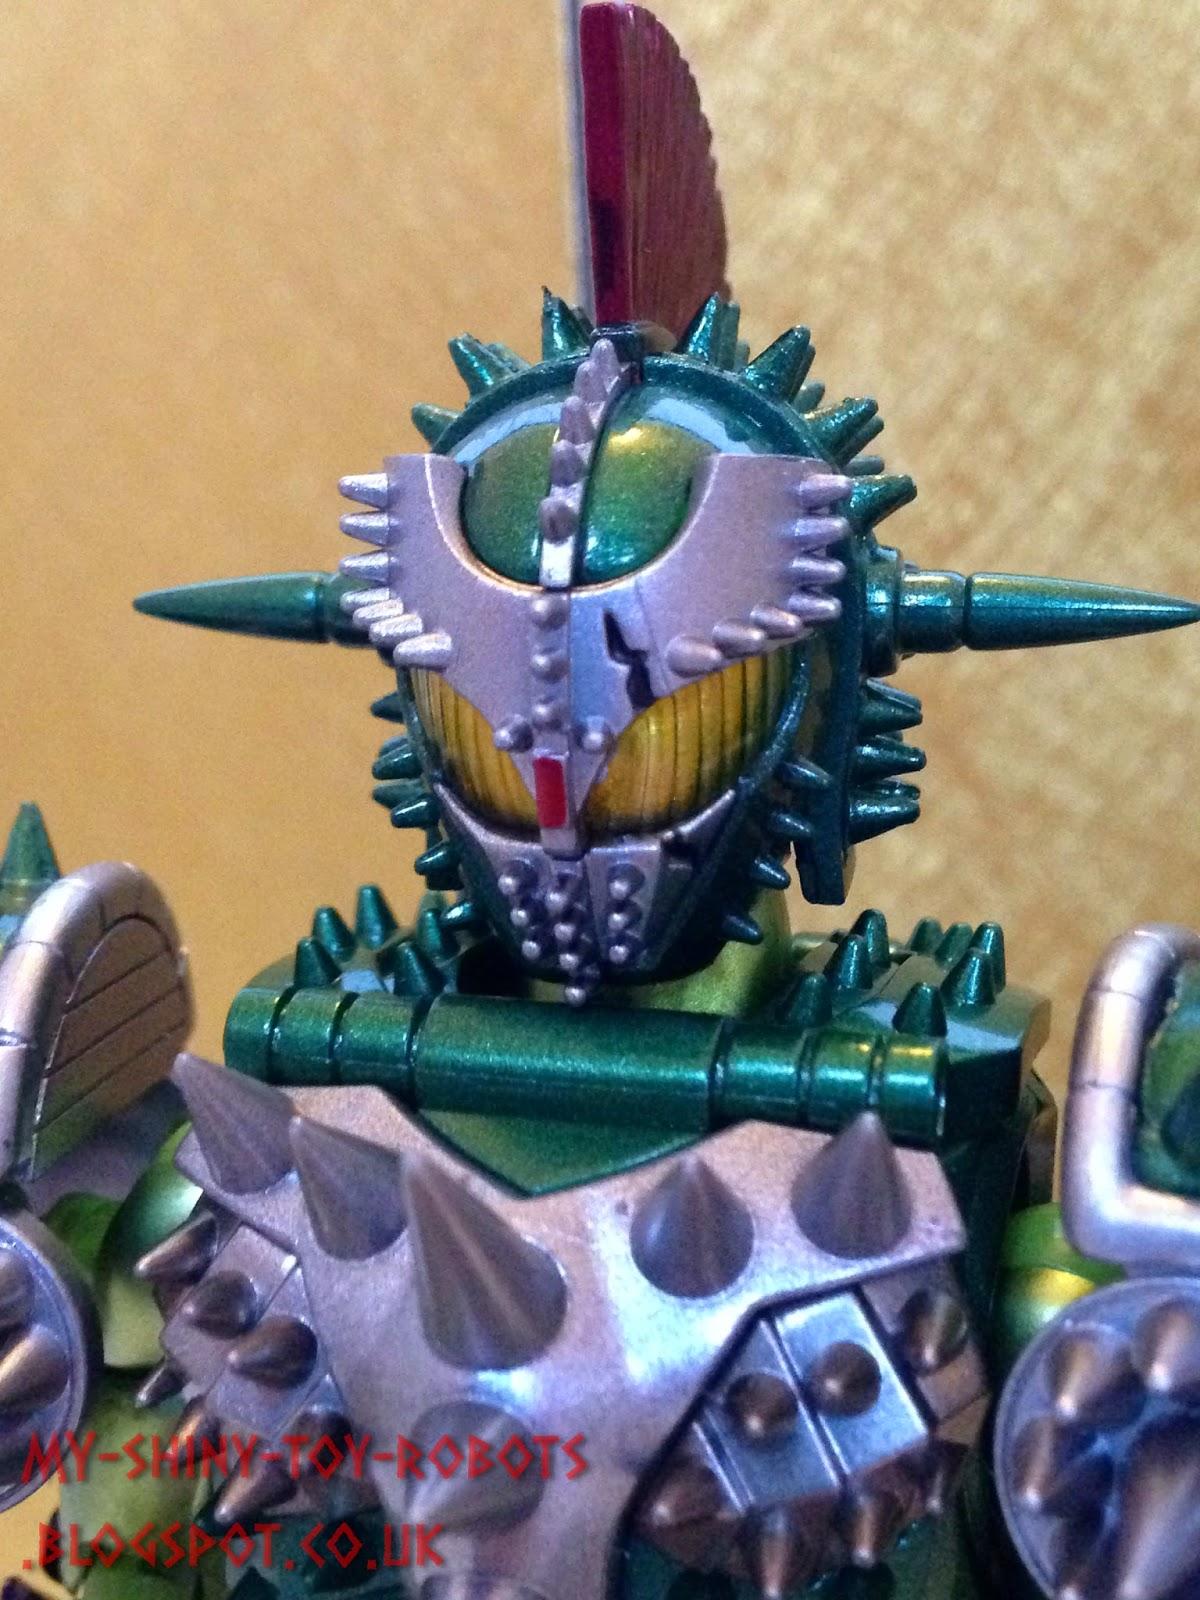 S.H. Figuarts Kamen Rider Bravo